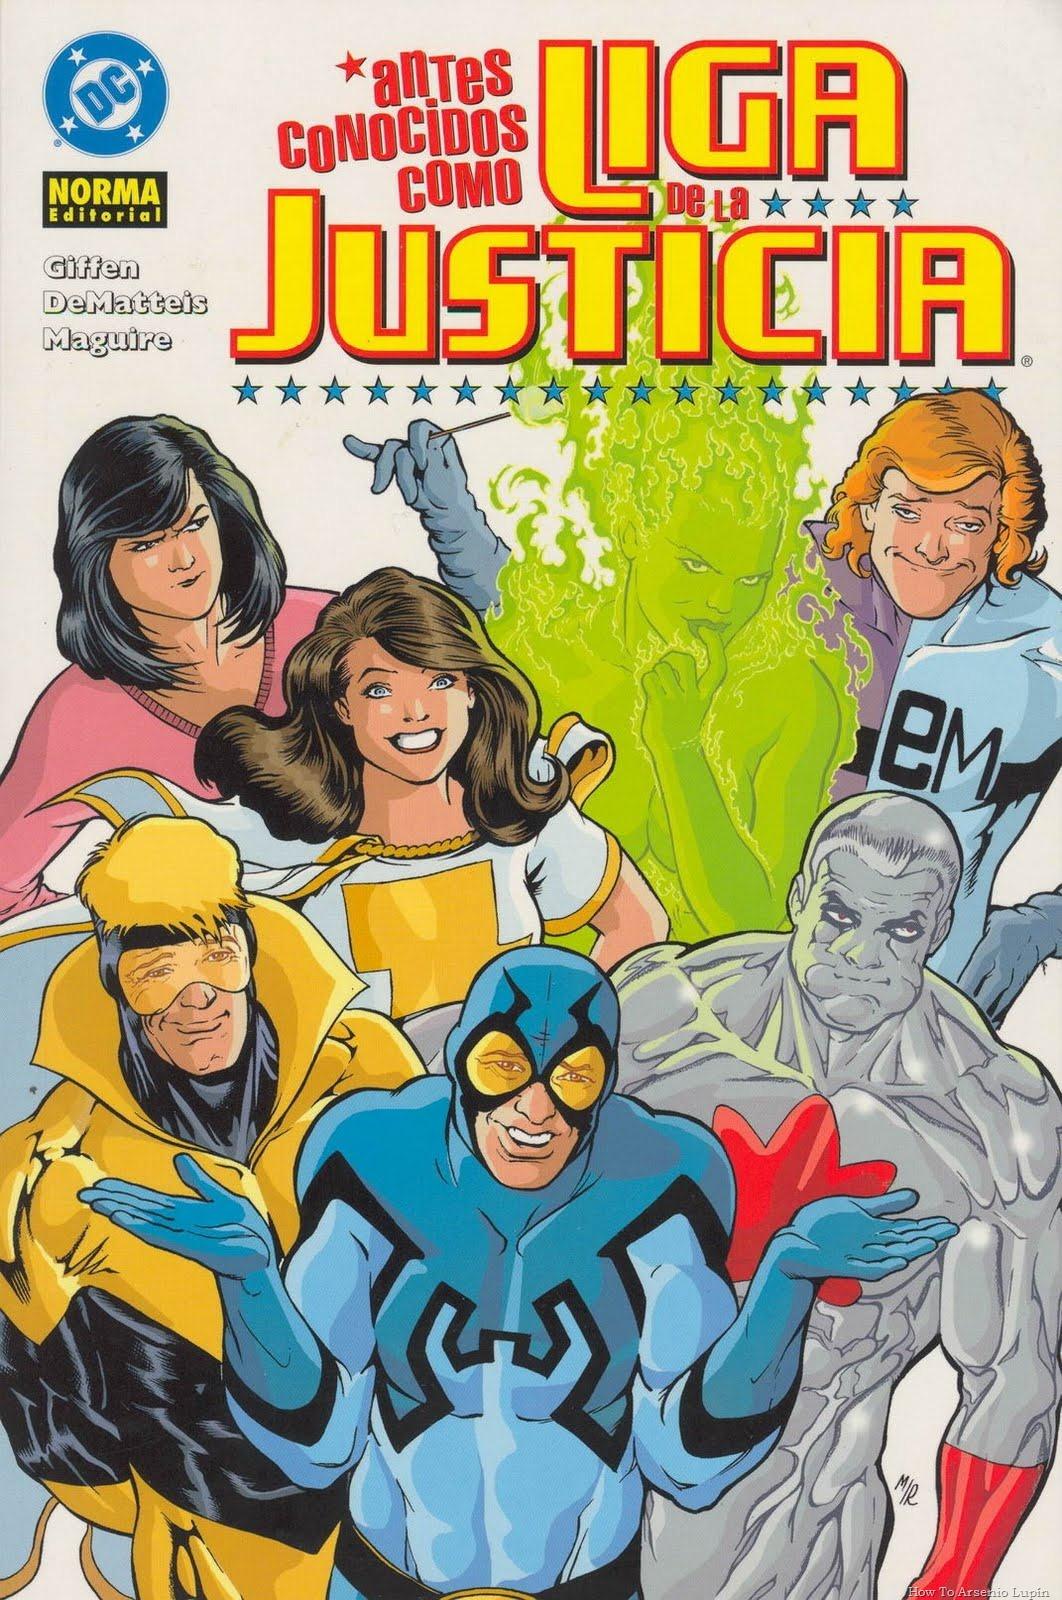 Antes_conocidos_como_Liga_Justicia3.jpg